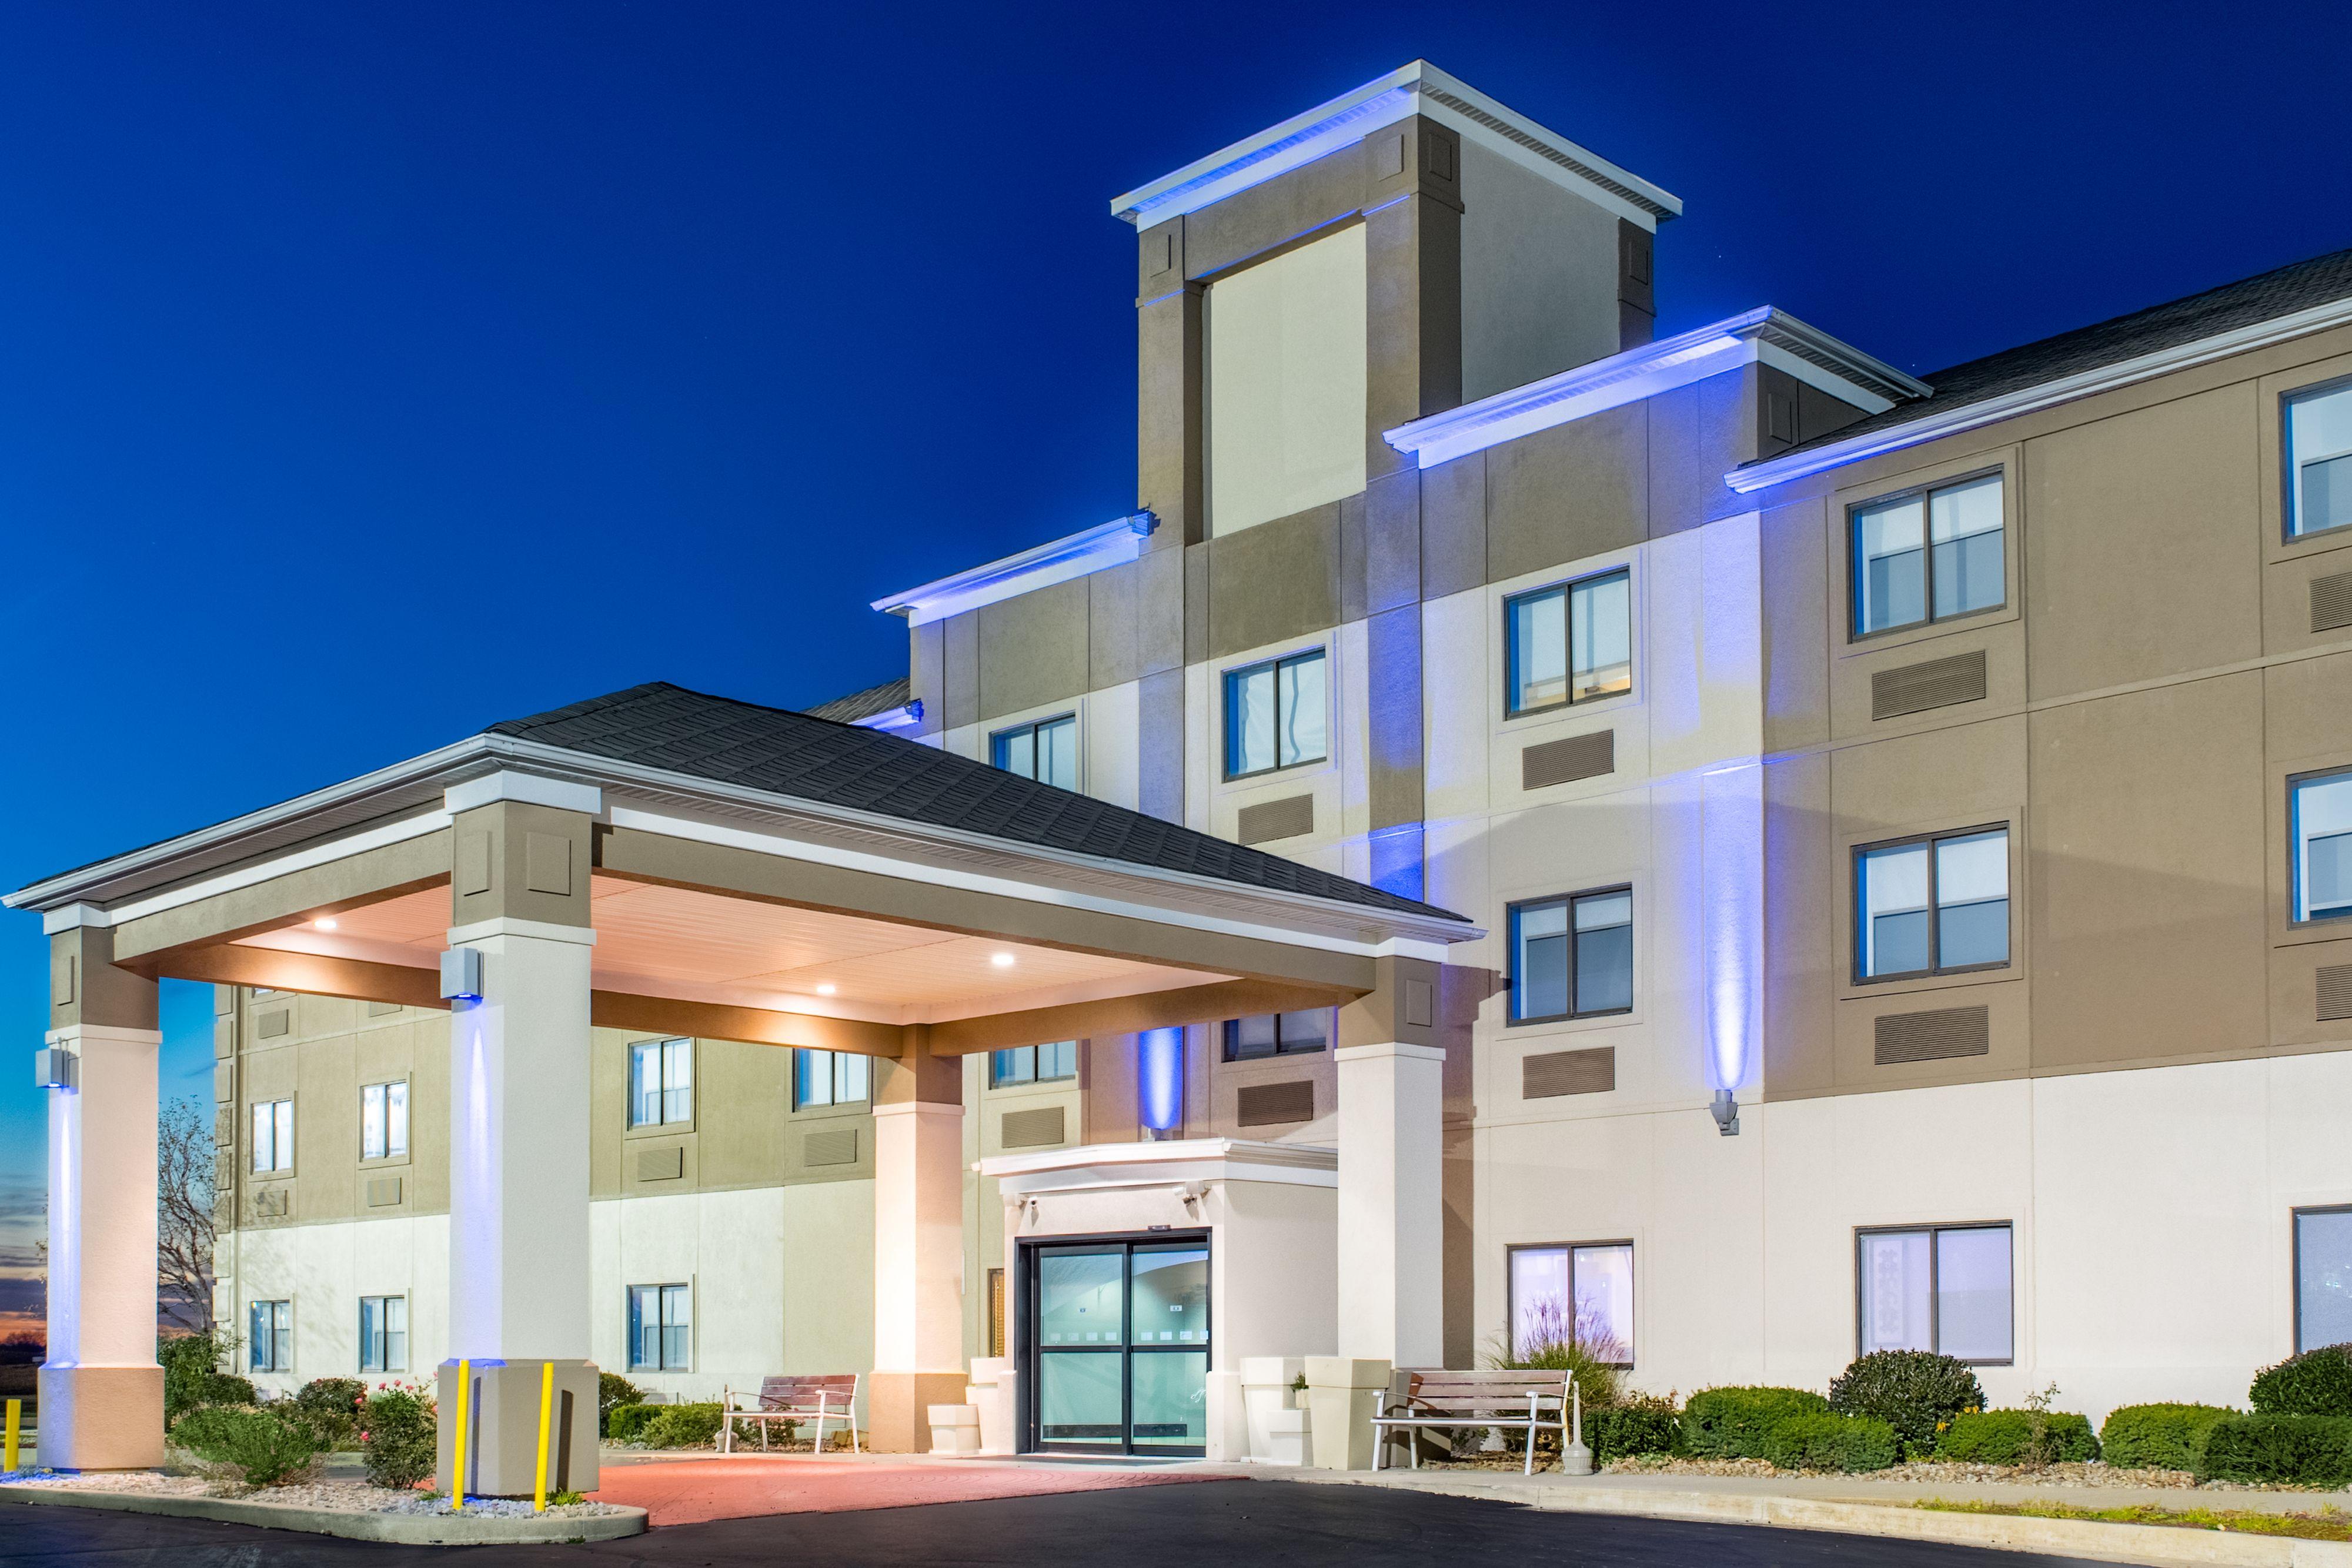 Hotels Motels In Alvin Tx Texas Ibegin